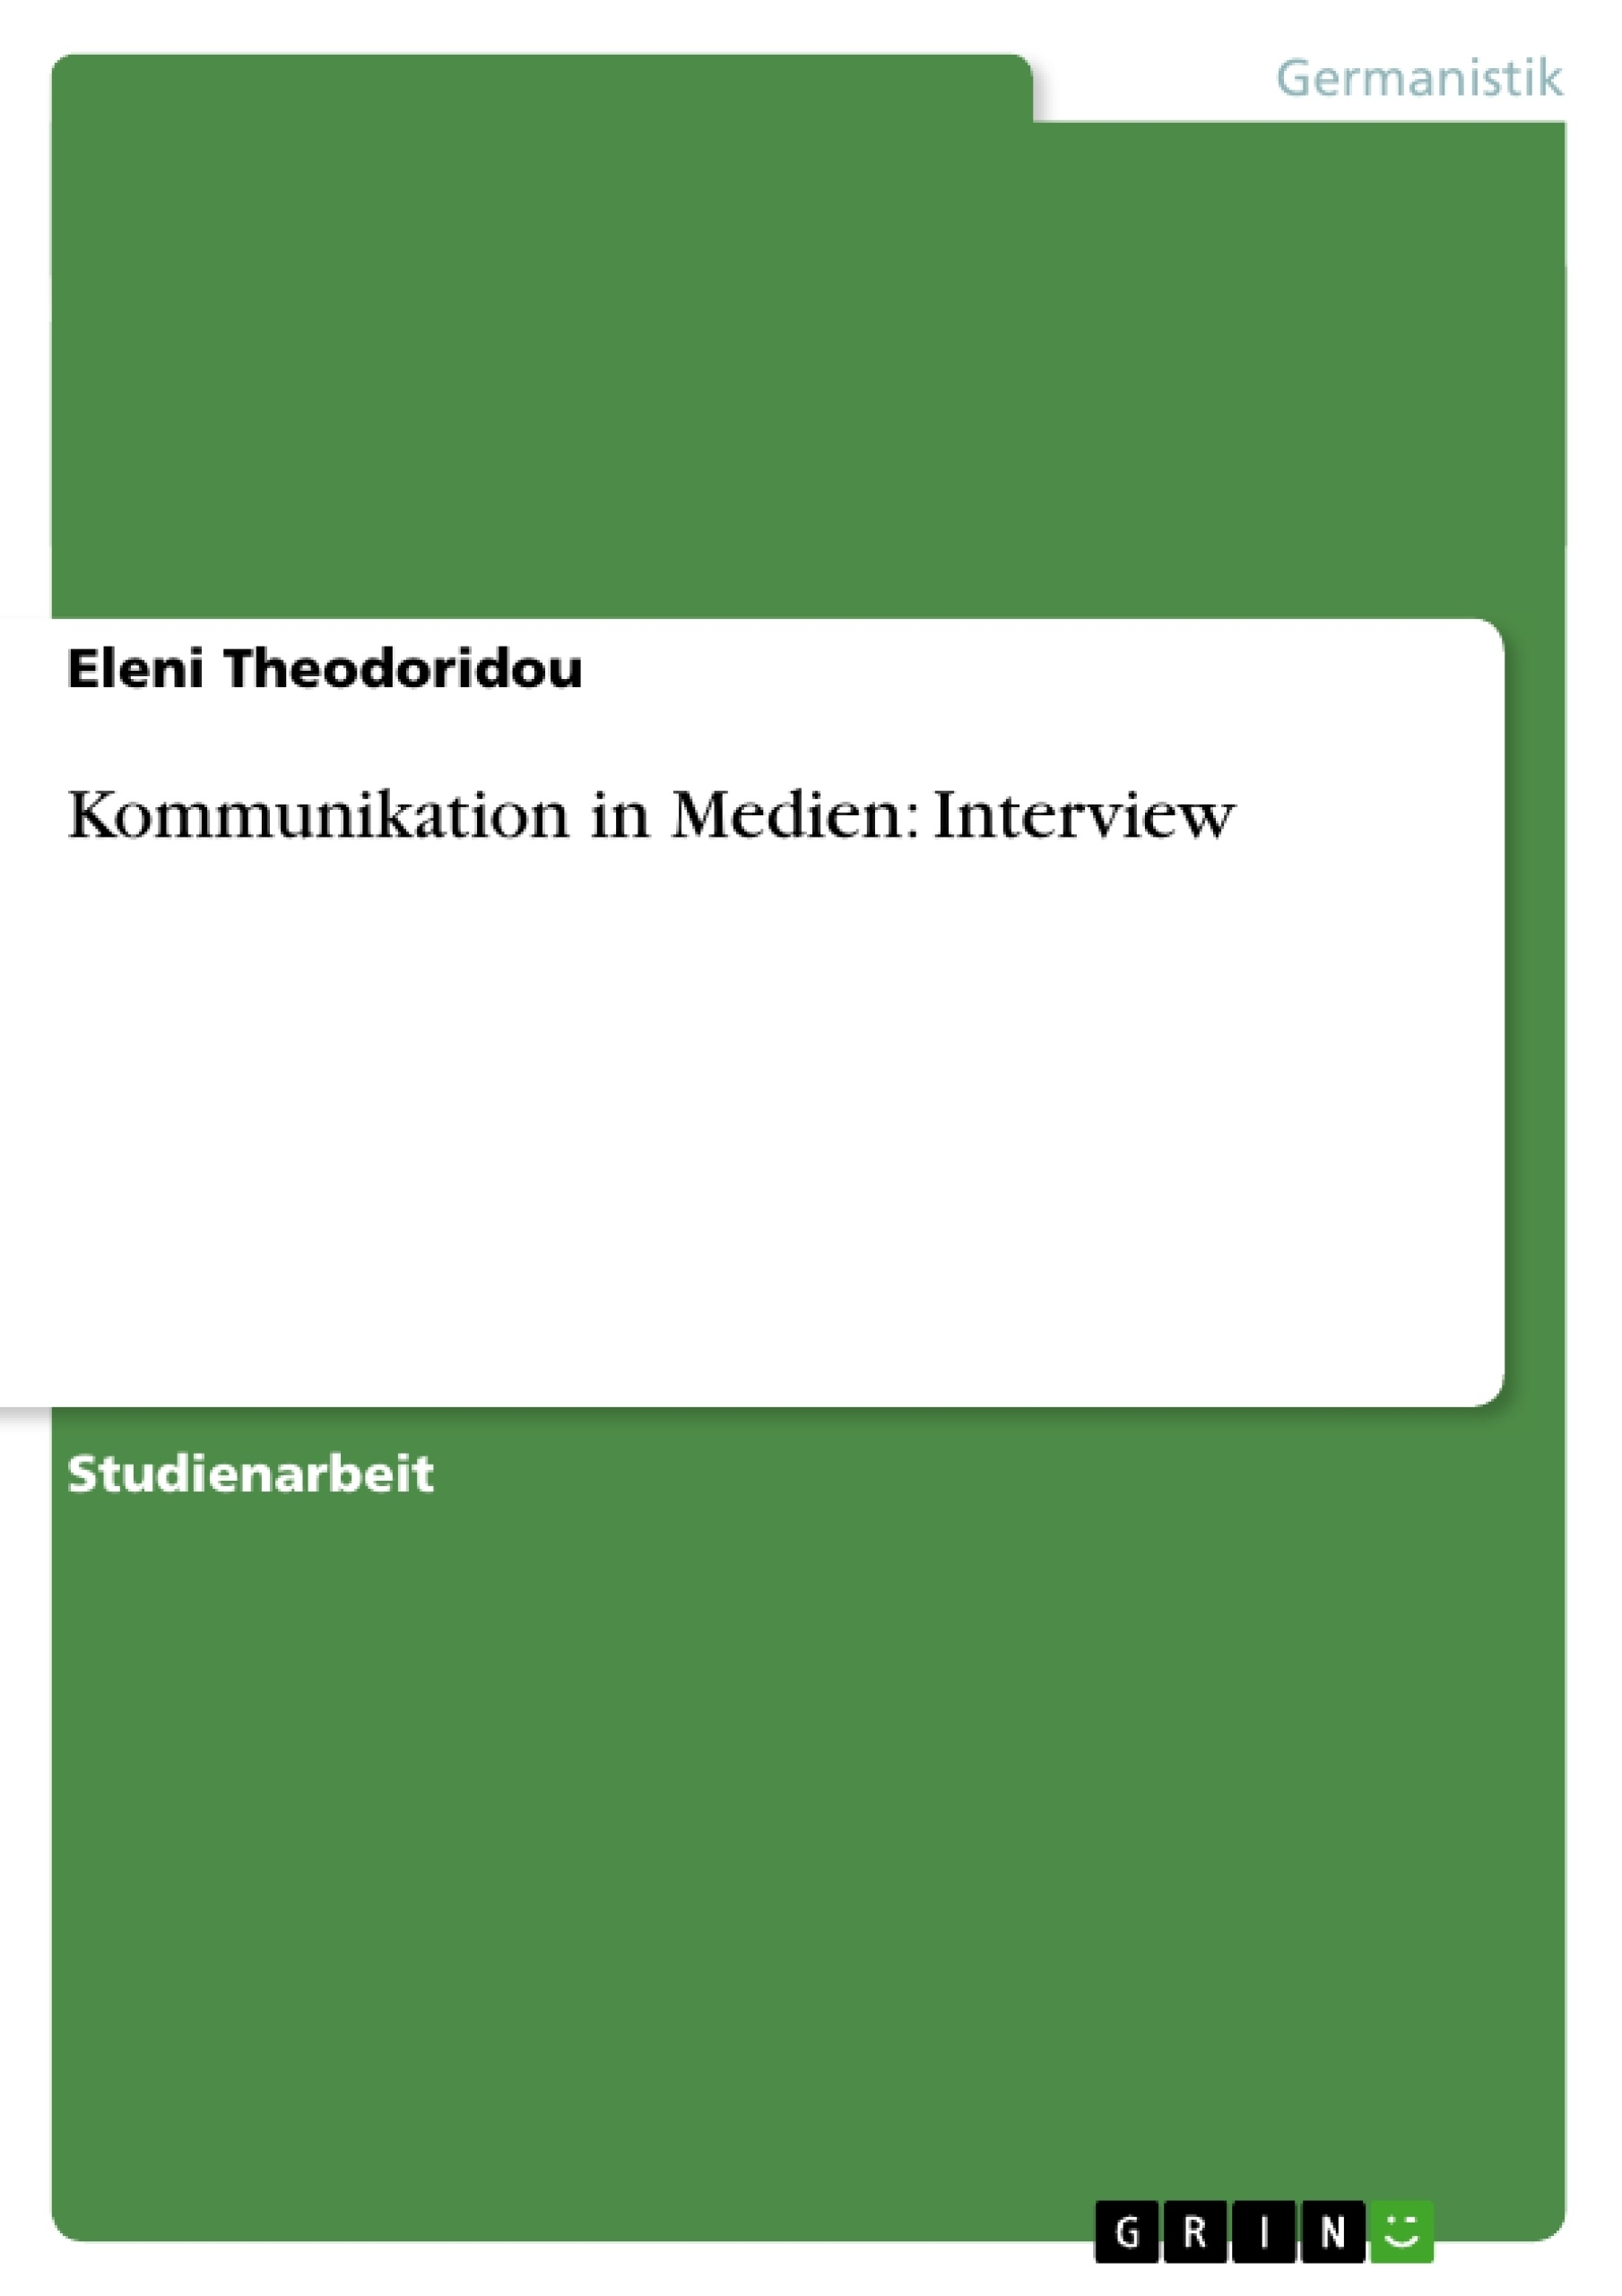 Titel: Kommunikation in Medien: Interview